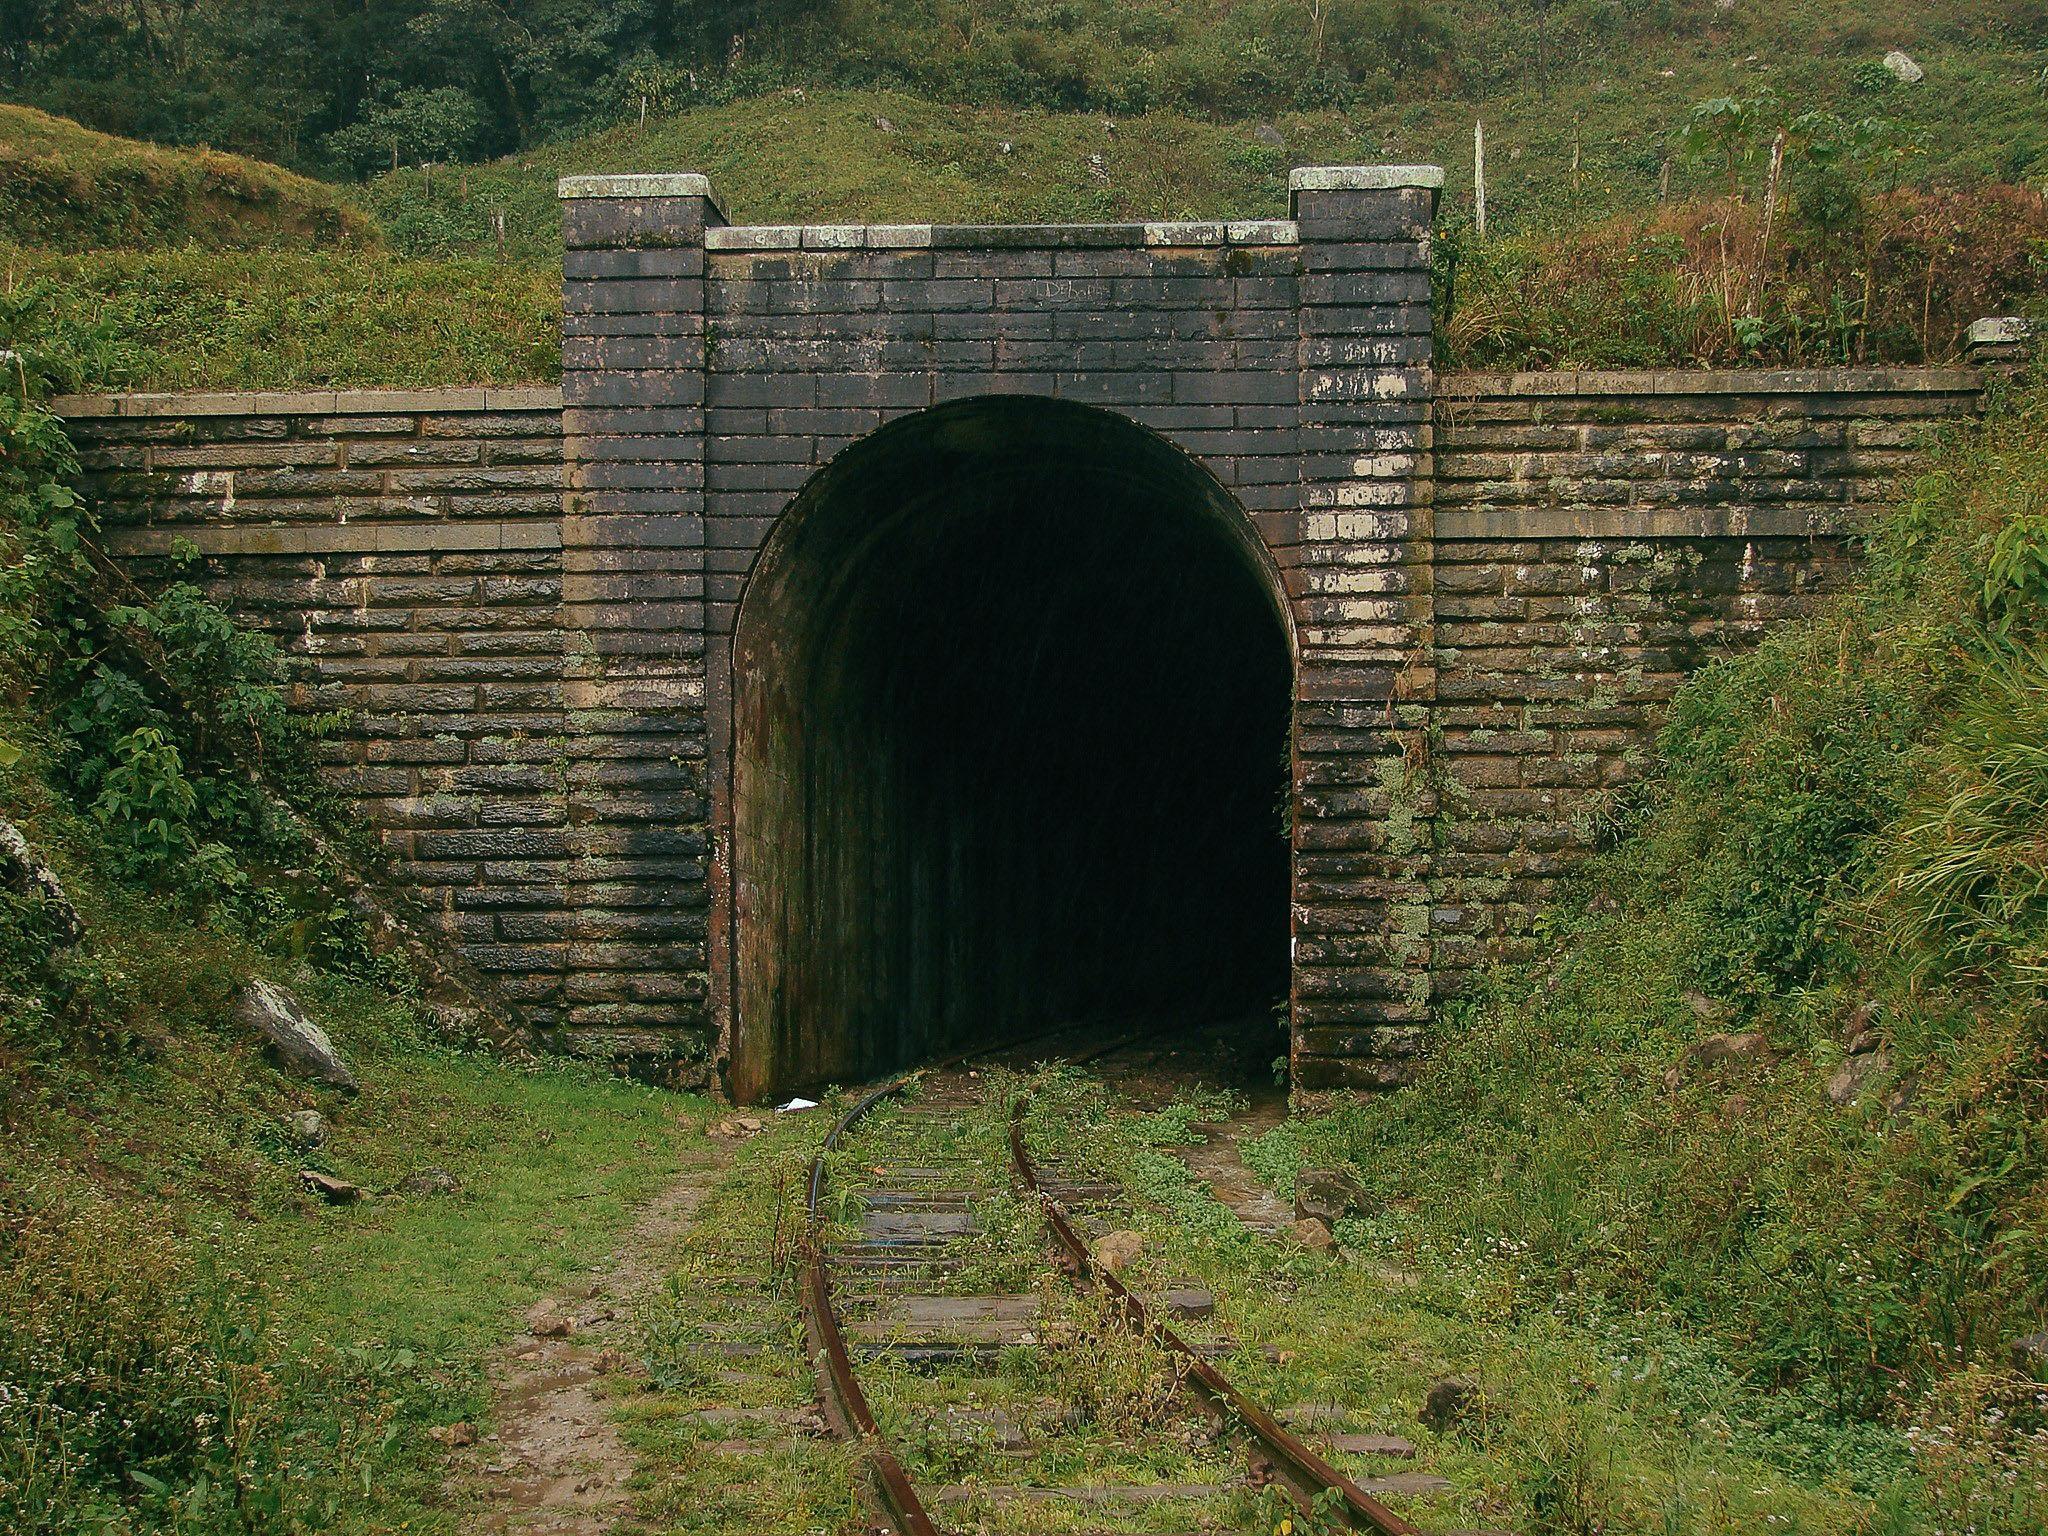 grande-tunel-garganta-do-embau-glauco-umbelino